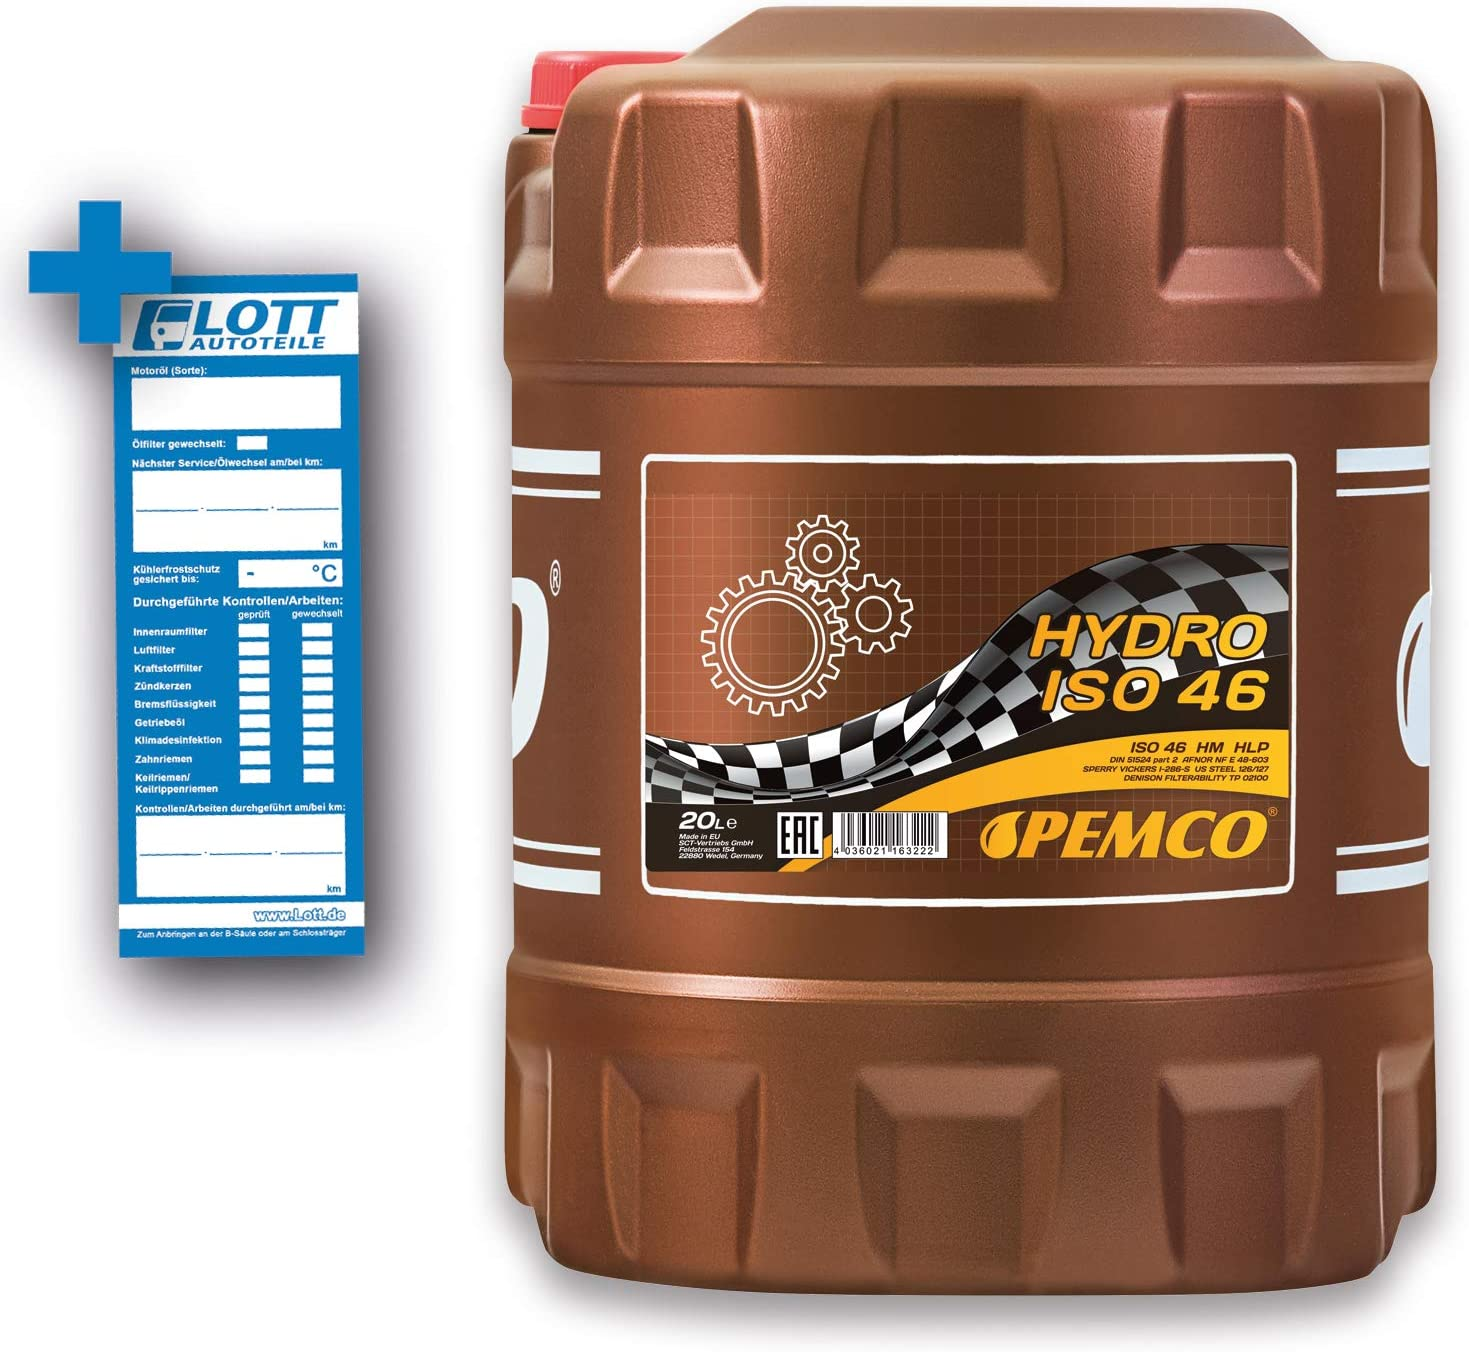 20 Liter Pemco Hydro Iso 46 Hydrauliköl Hlp 46 Auto